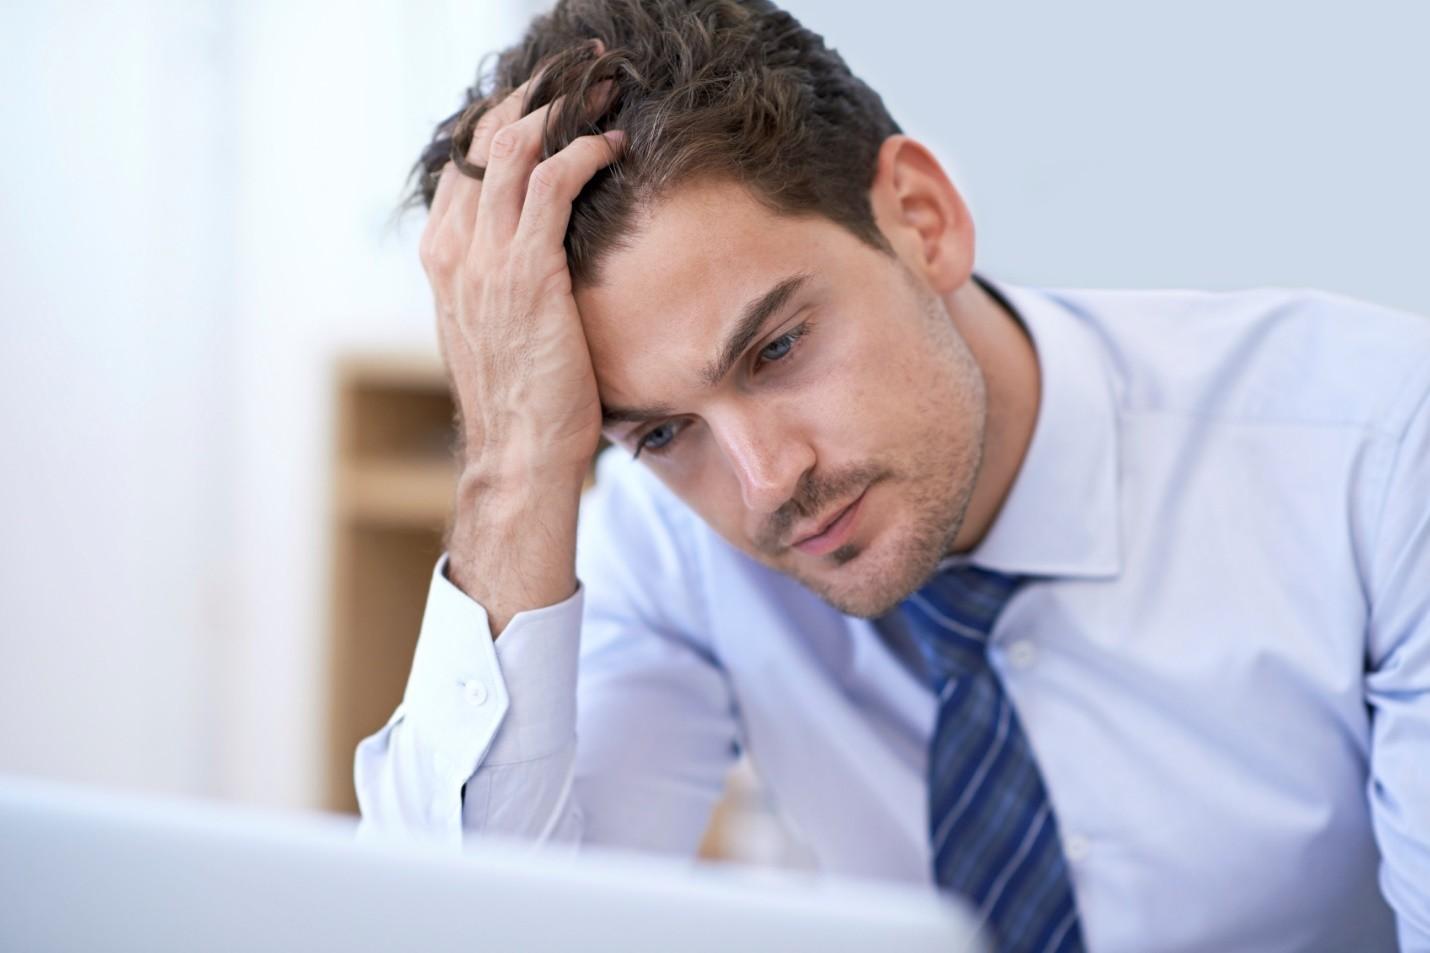 stress-among-men-1213-2